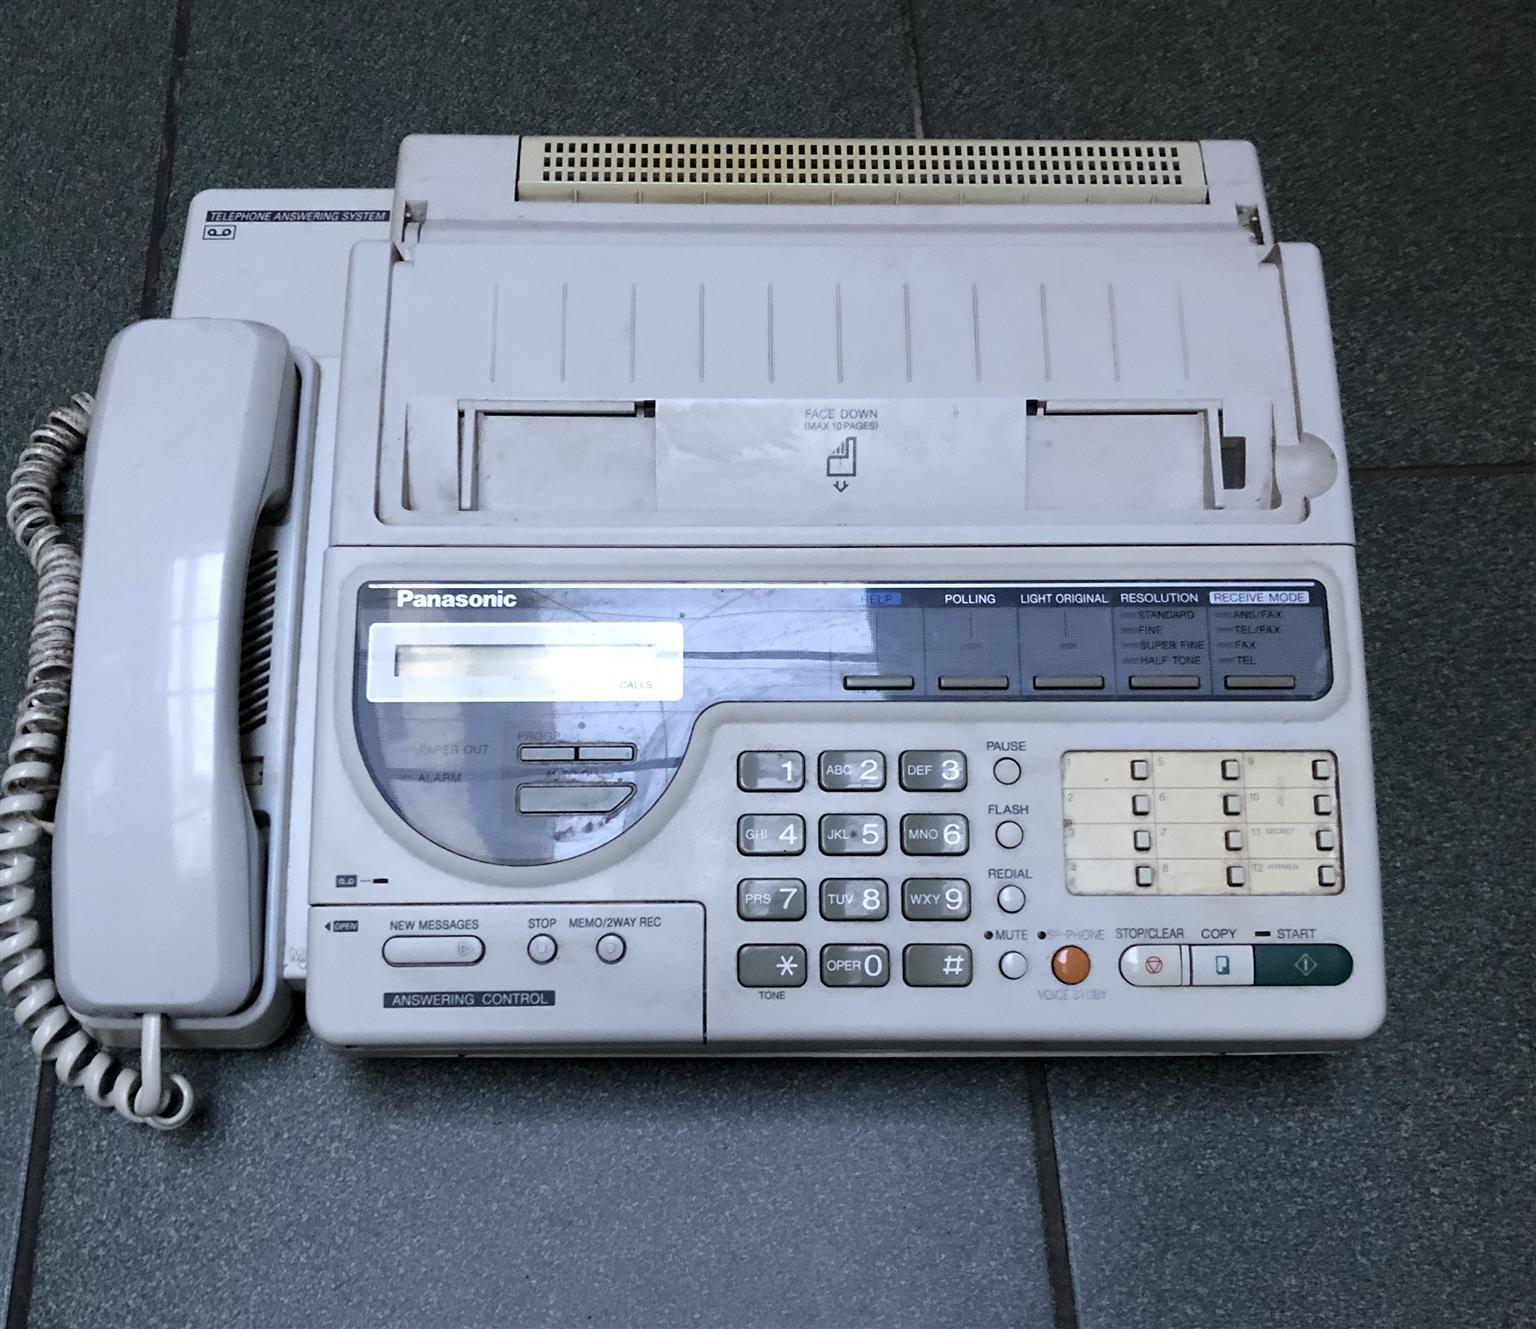 Panasonic KX-F2350SA Telephone Fax and Answering machine